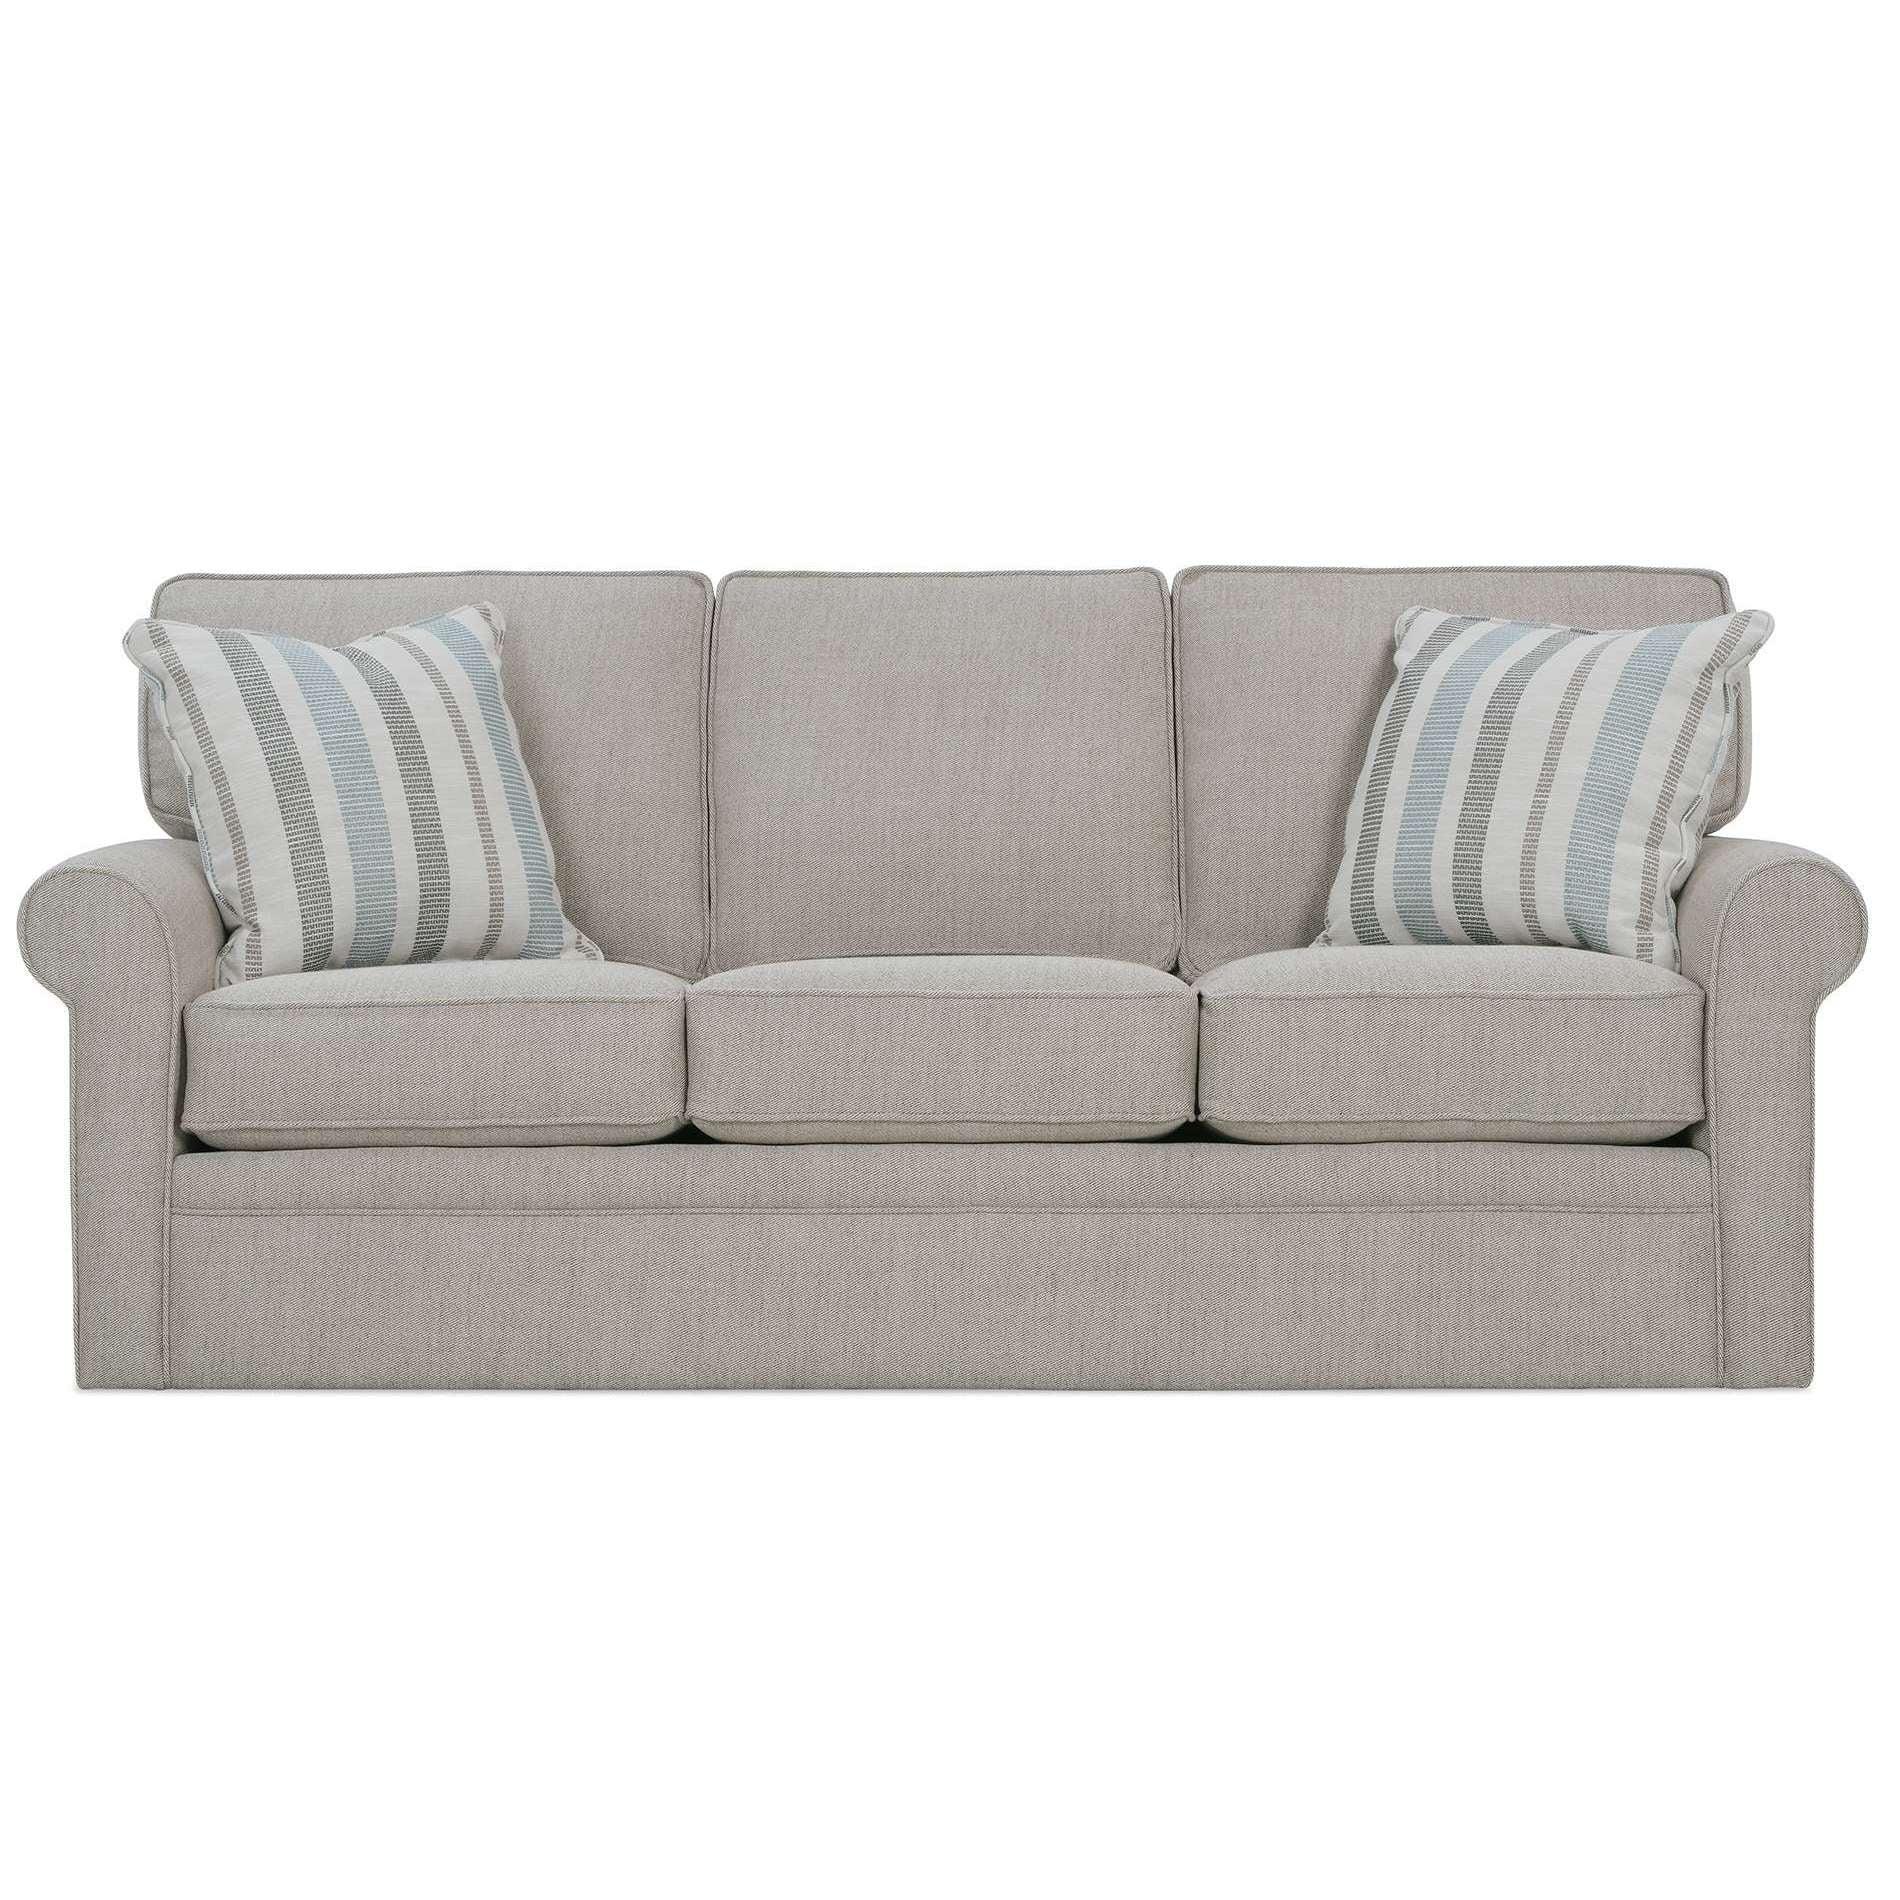 dalton sofa bed modern sofas on clearance by rowe barrow fine furniture